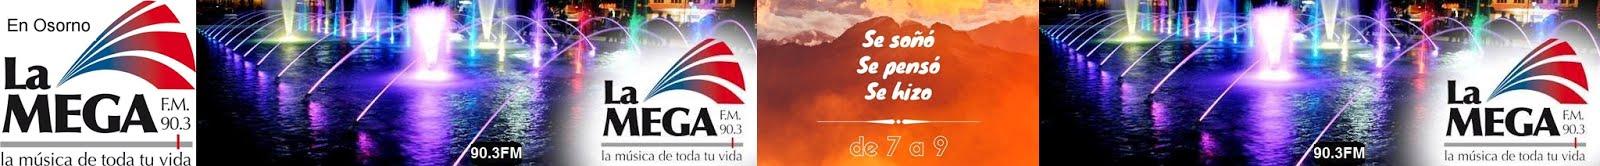 La mega Osorno